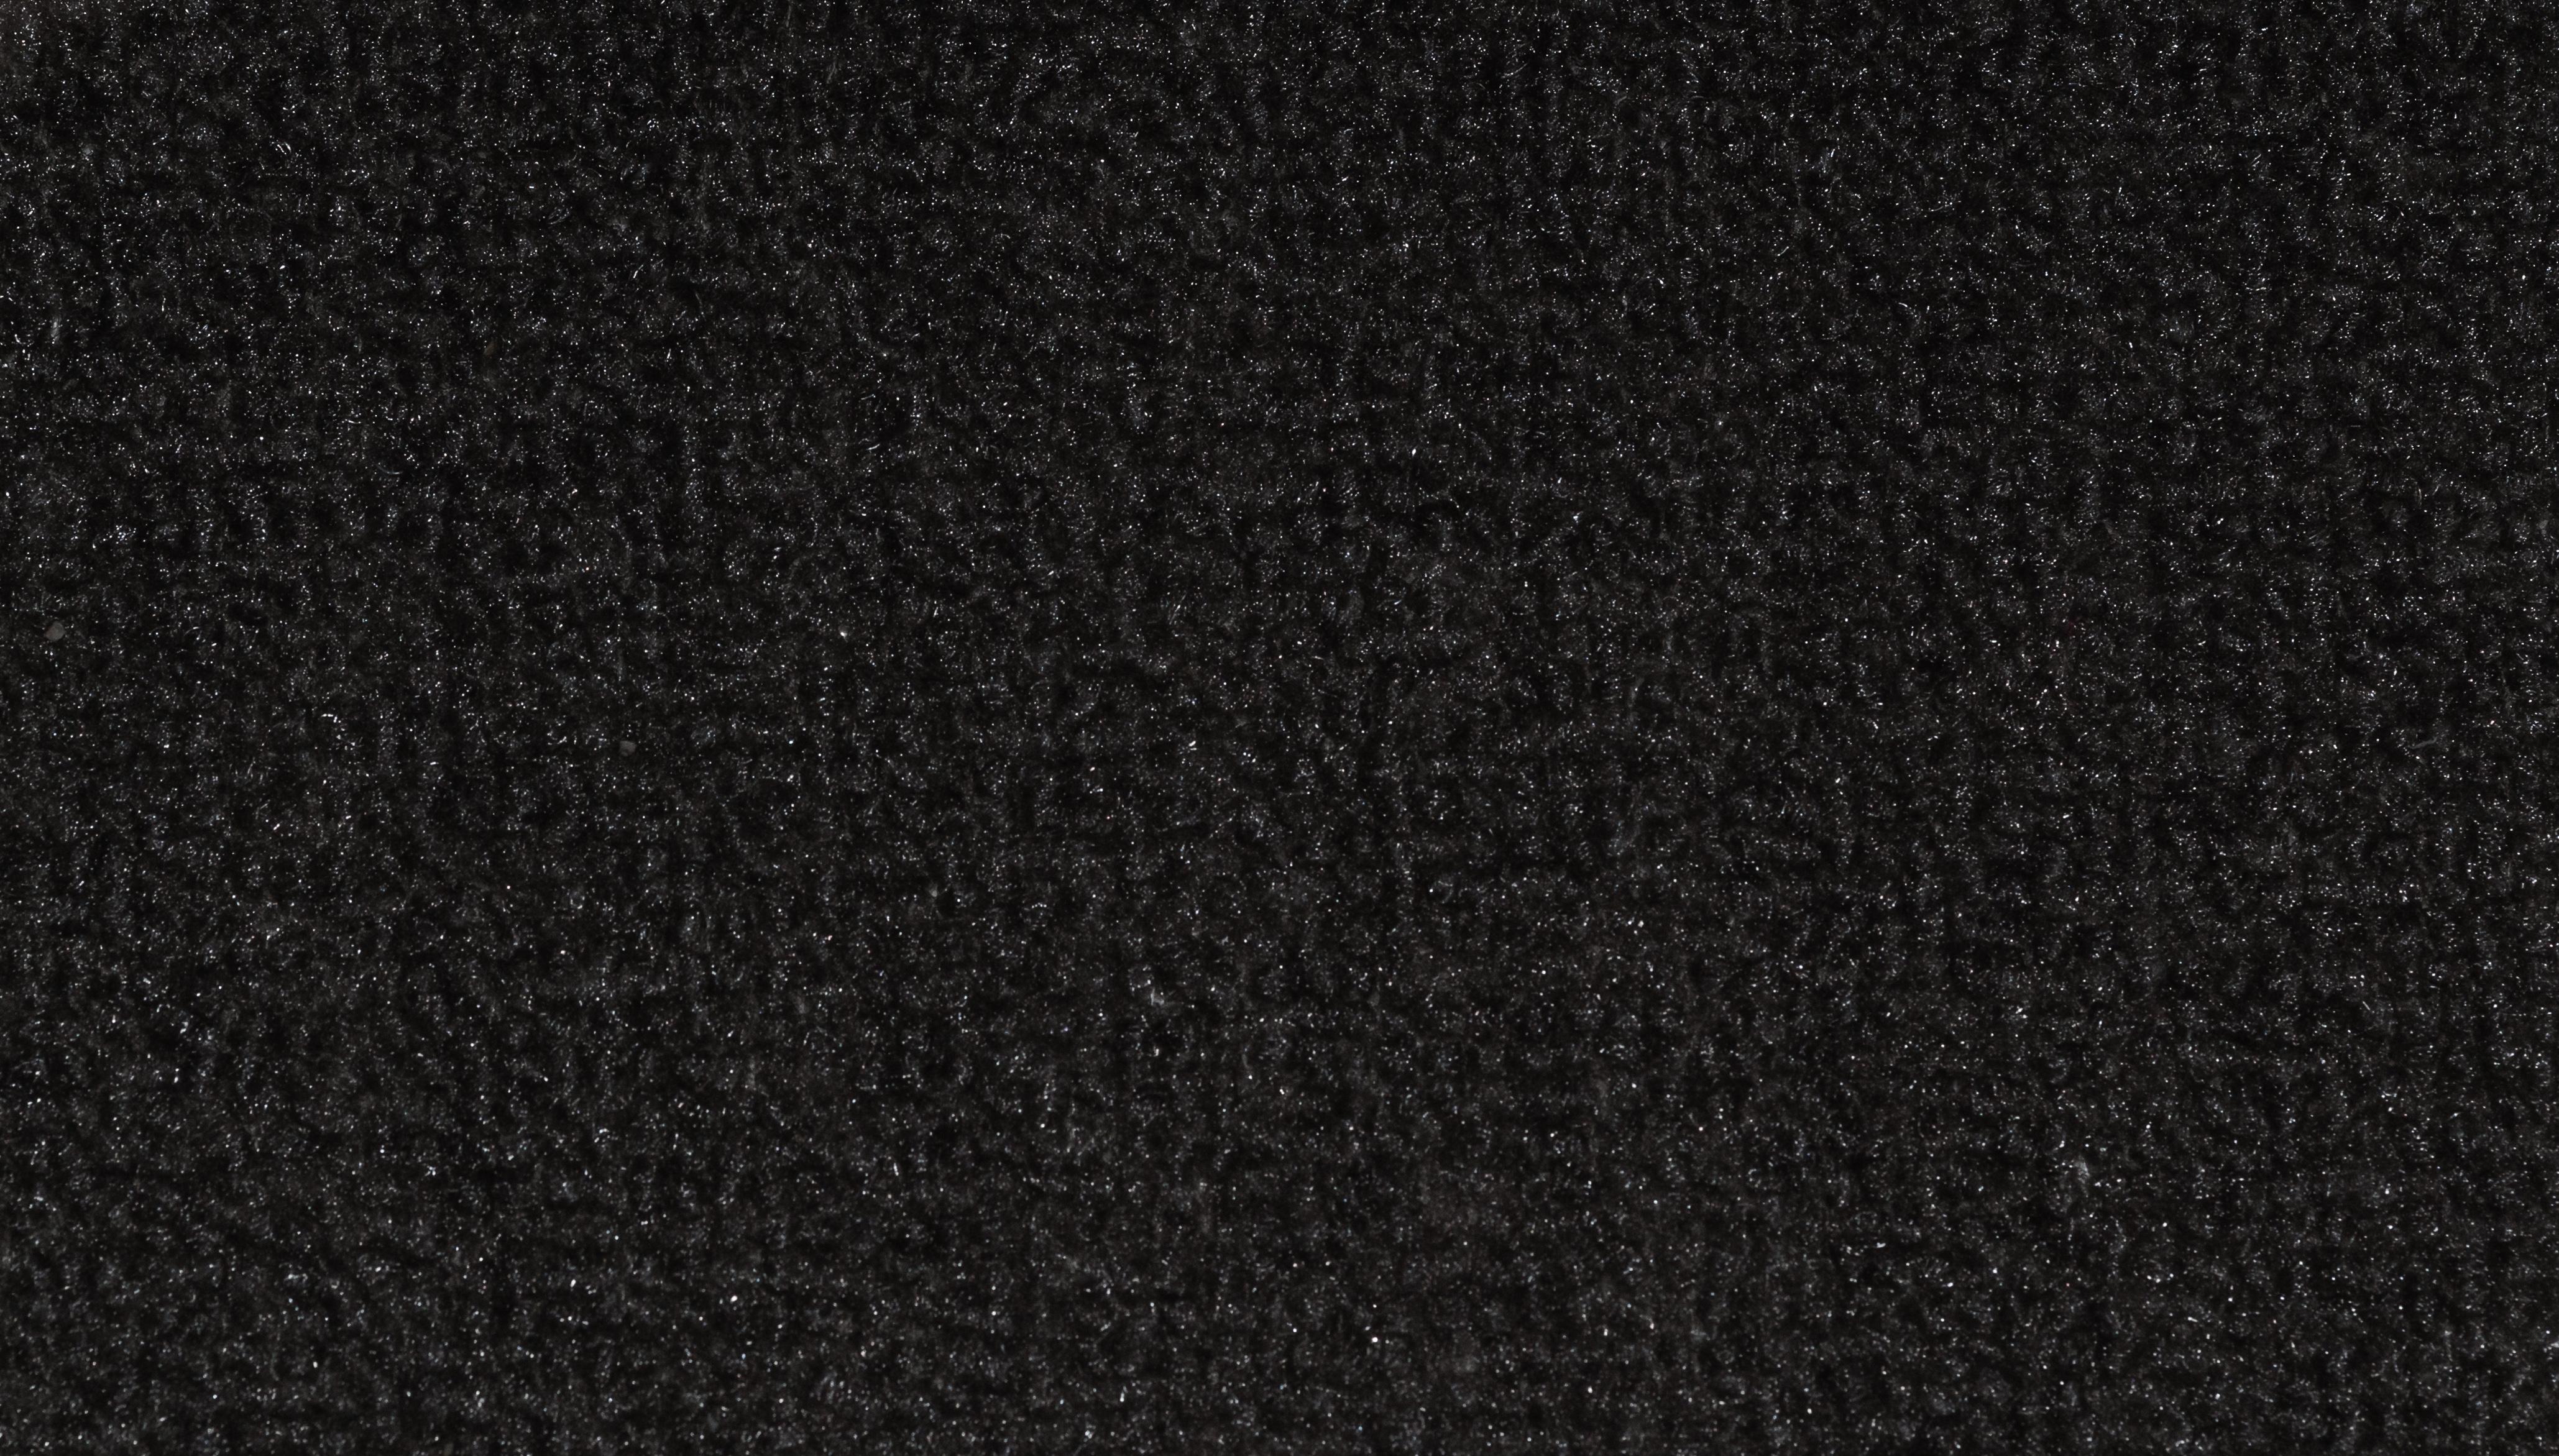 Dark Black Carpet Pattern Texture Advanced Cleaning